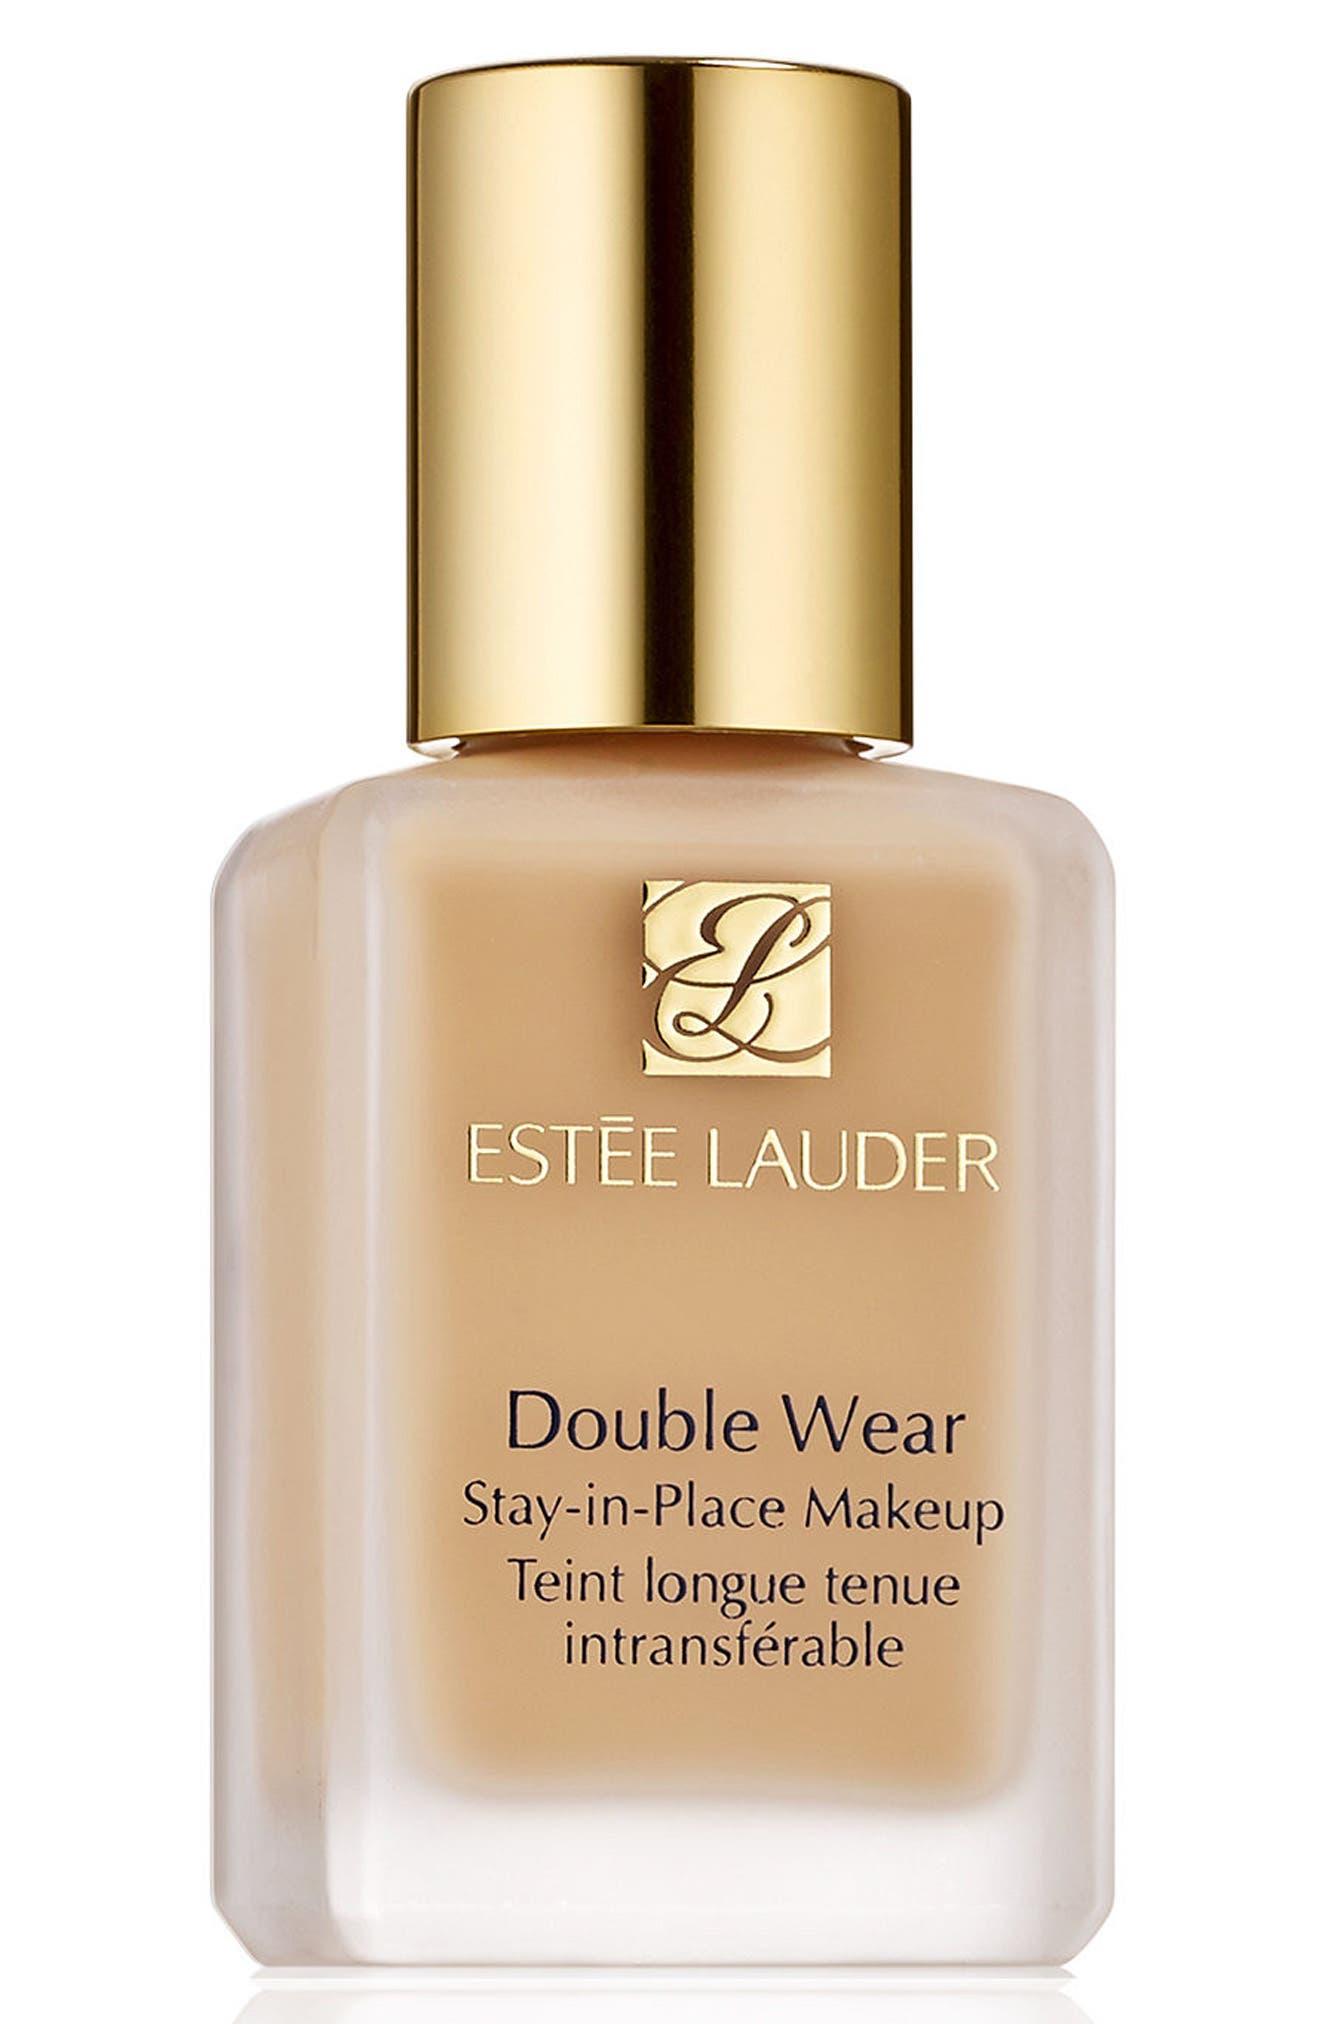 Estee Lauder Double Wear Stay-In-Place Liquid Makeup - 1W2 Sand